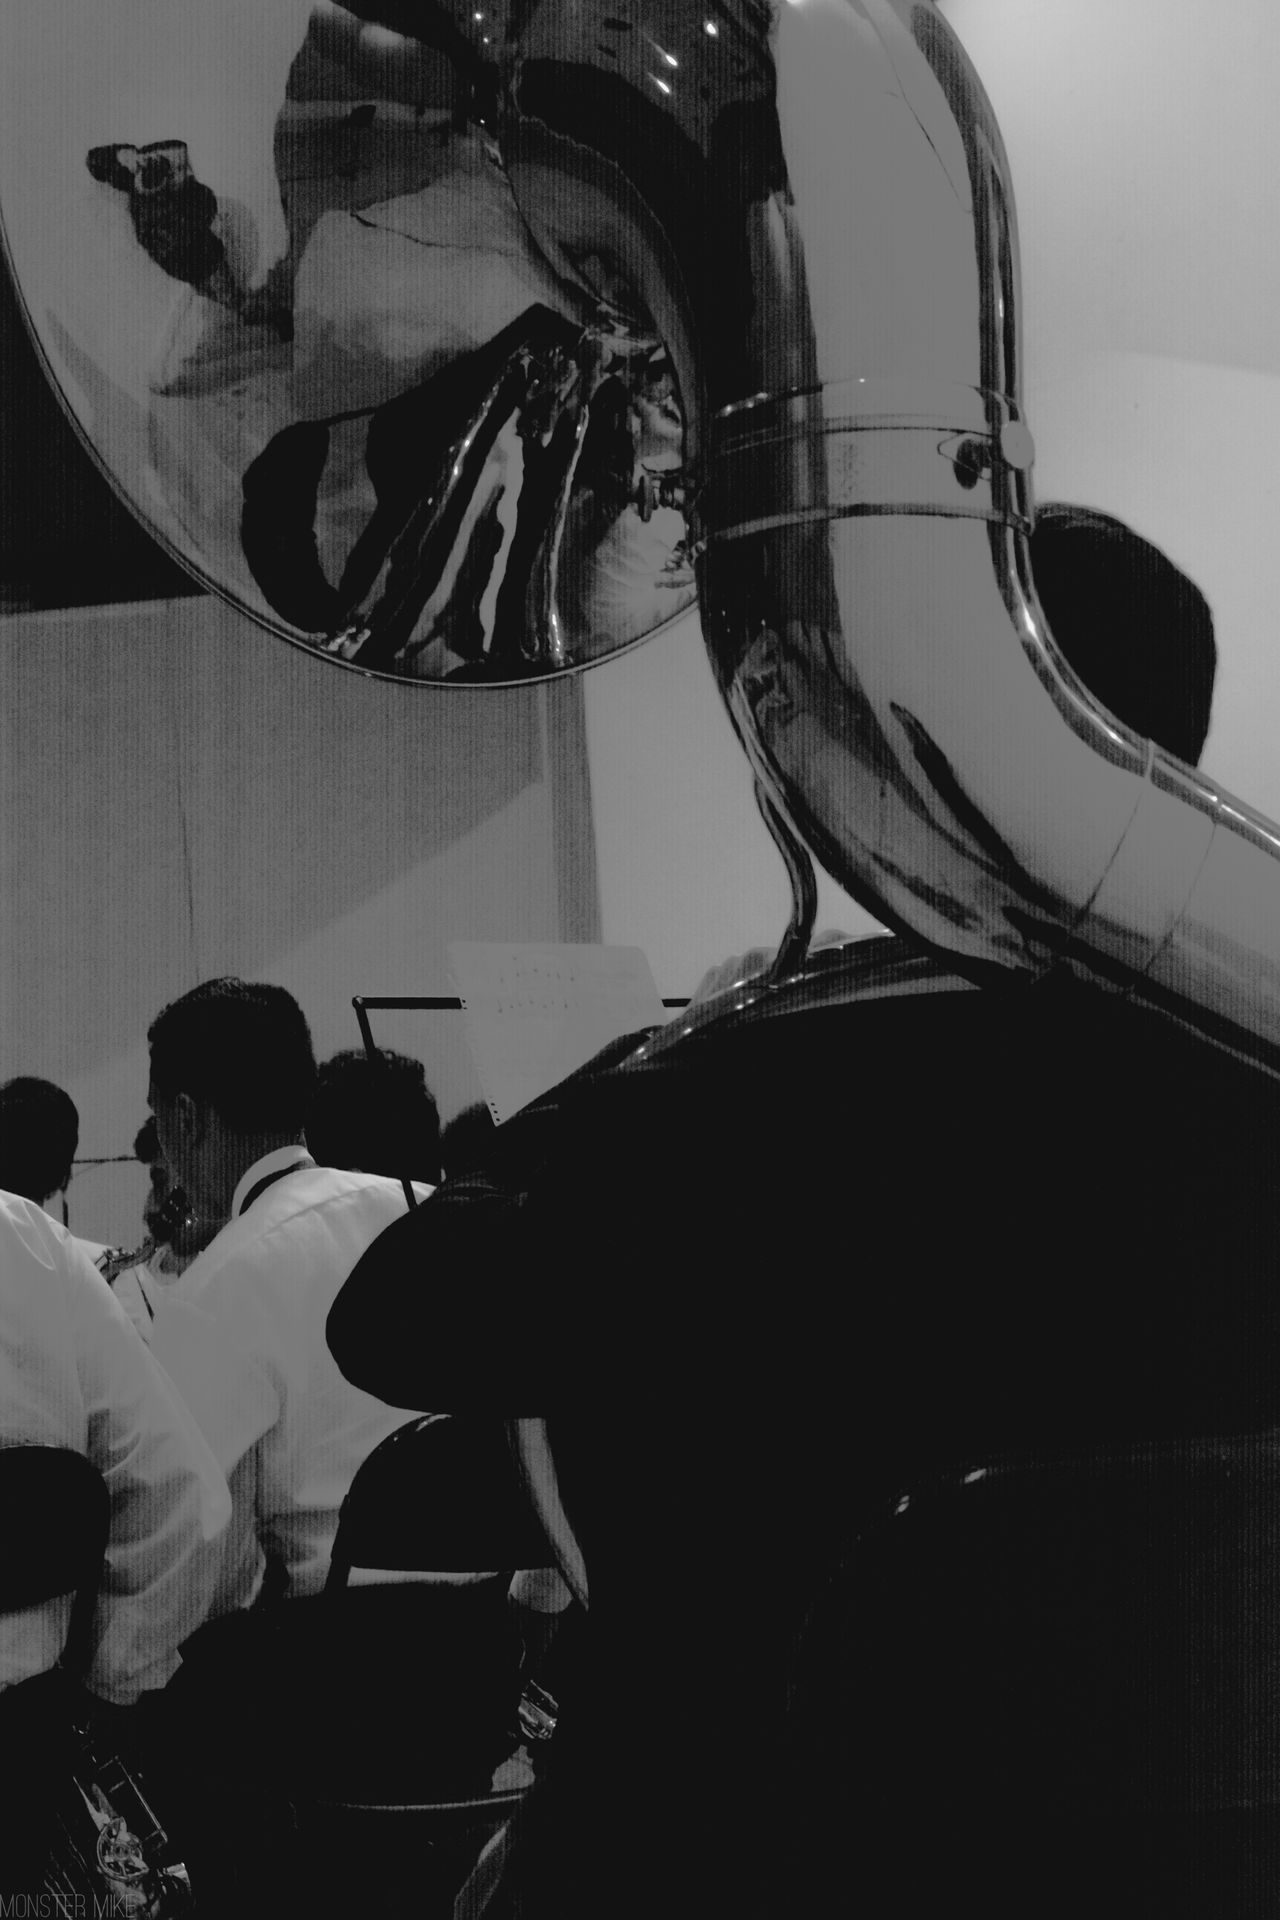 Music Musician Live Music Musica Photographer Reflection Tuba Black And White Blackandwhite Black & White Black&white Blackandwhite Photography Monochrome